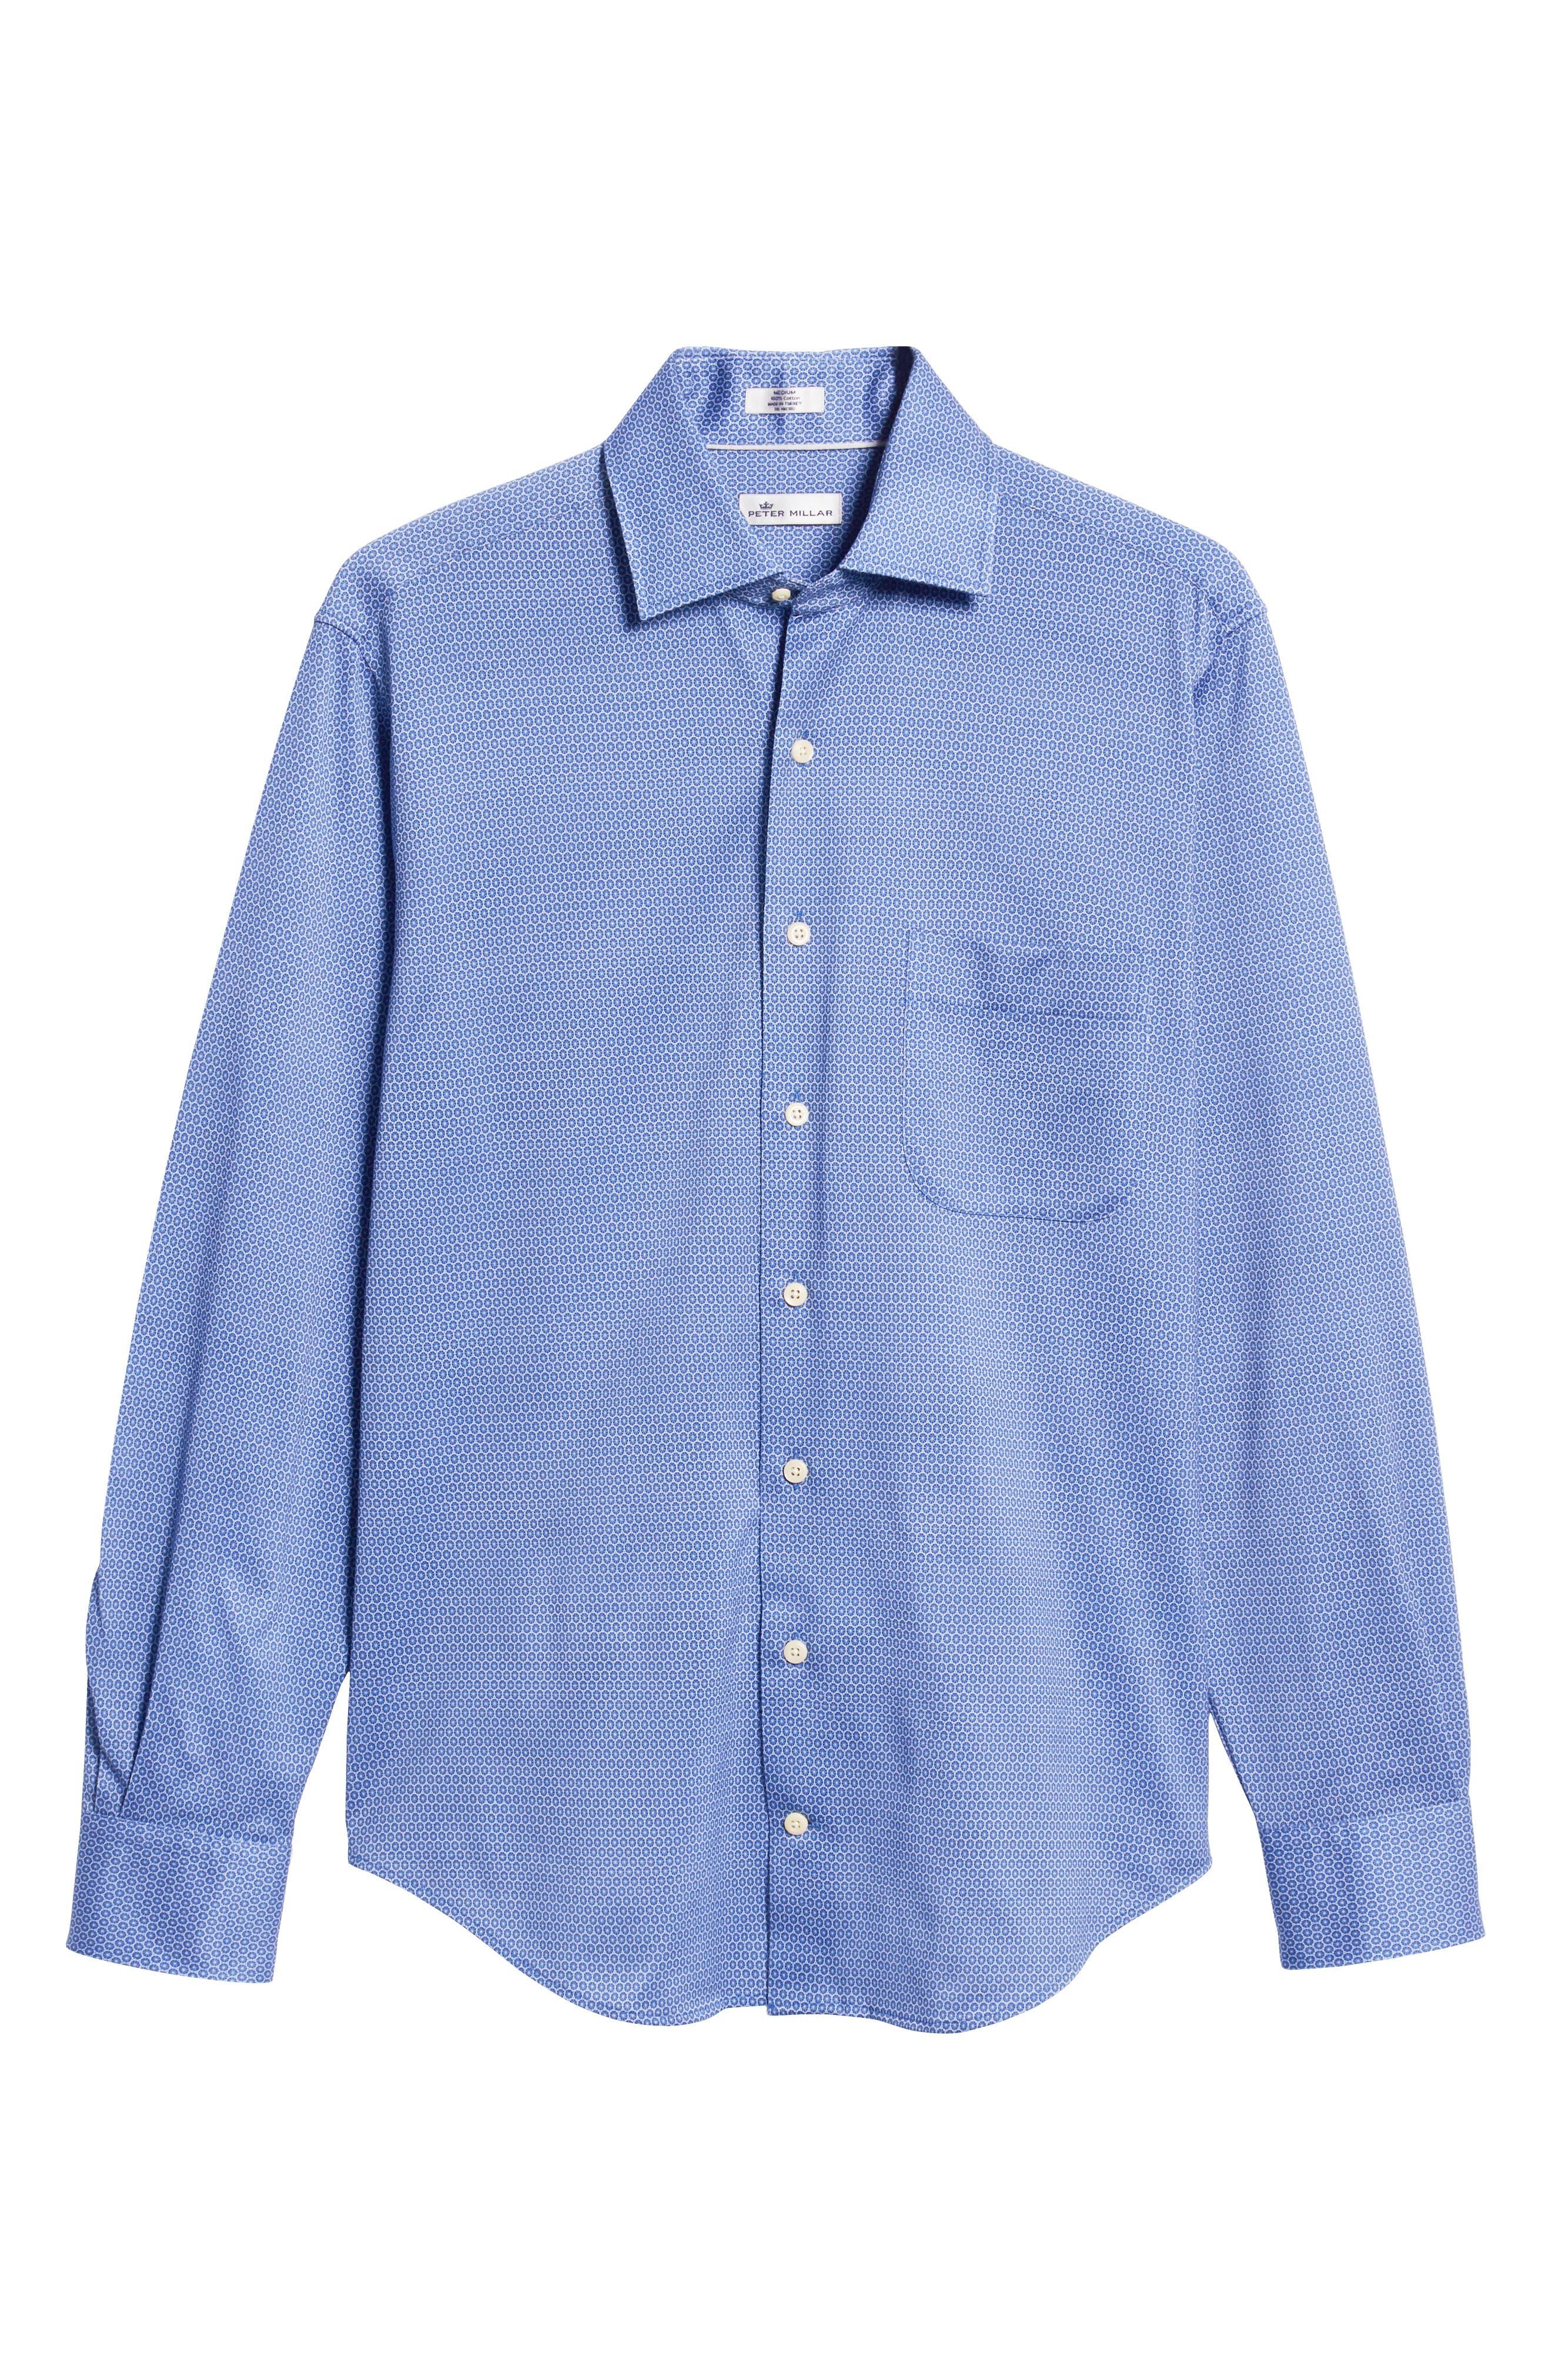 Schwinn Sport Shirt,                             Alternate thumbnail 5, color,                             PLAZA BLUE